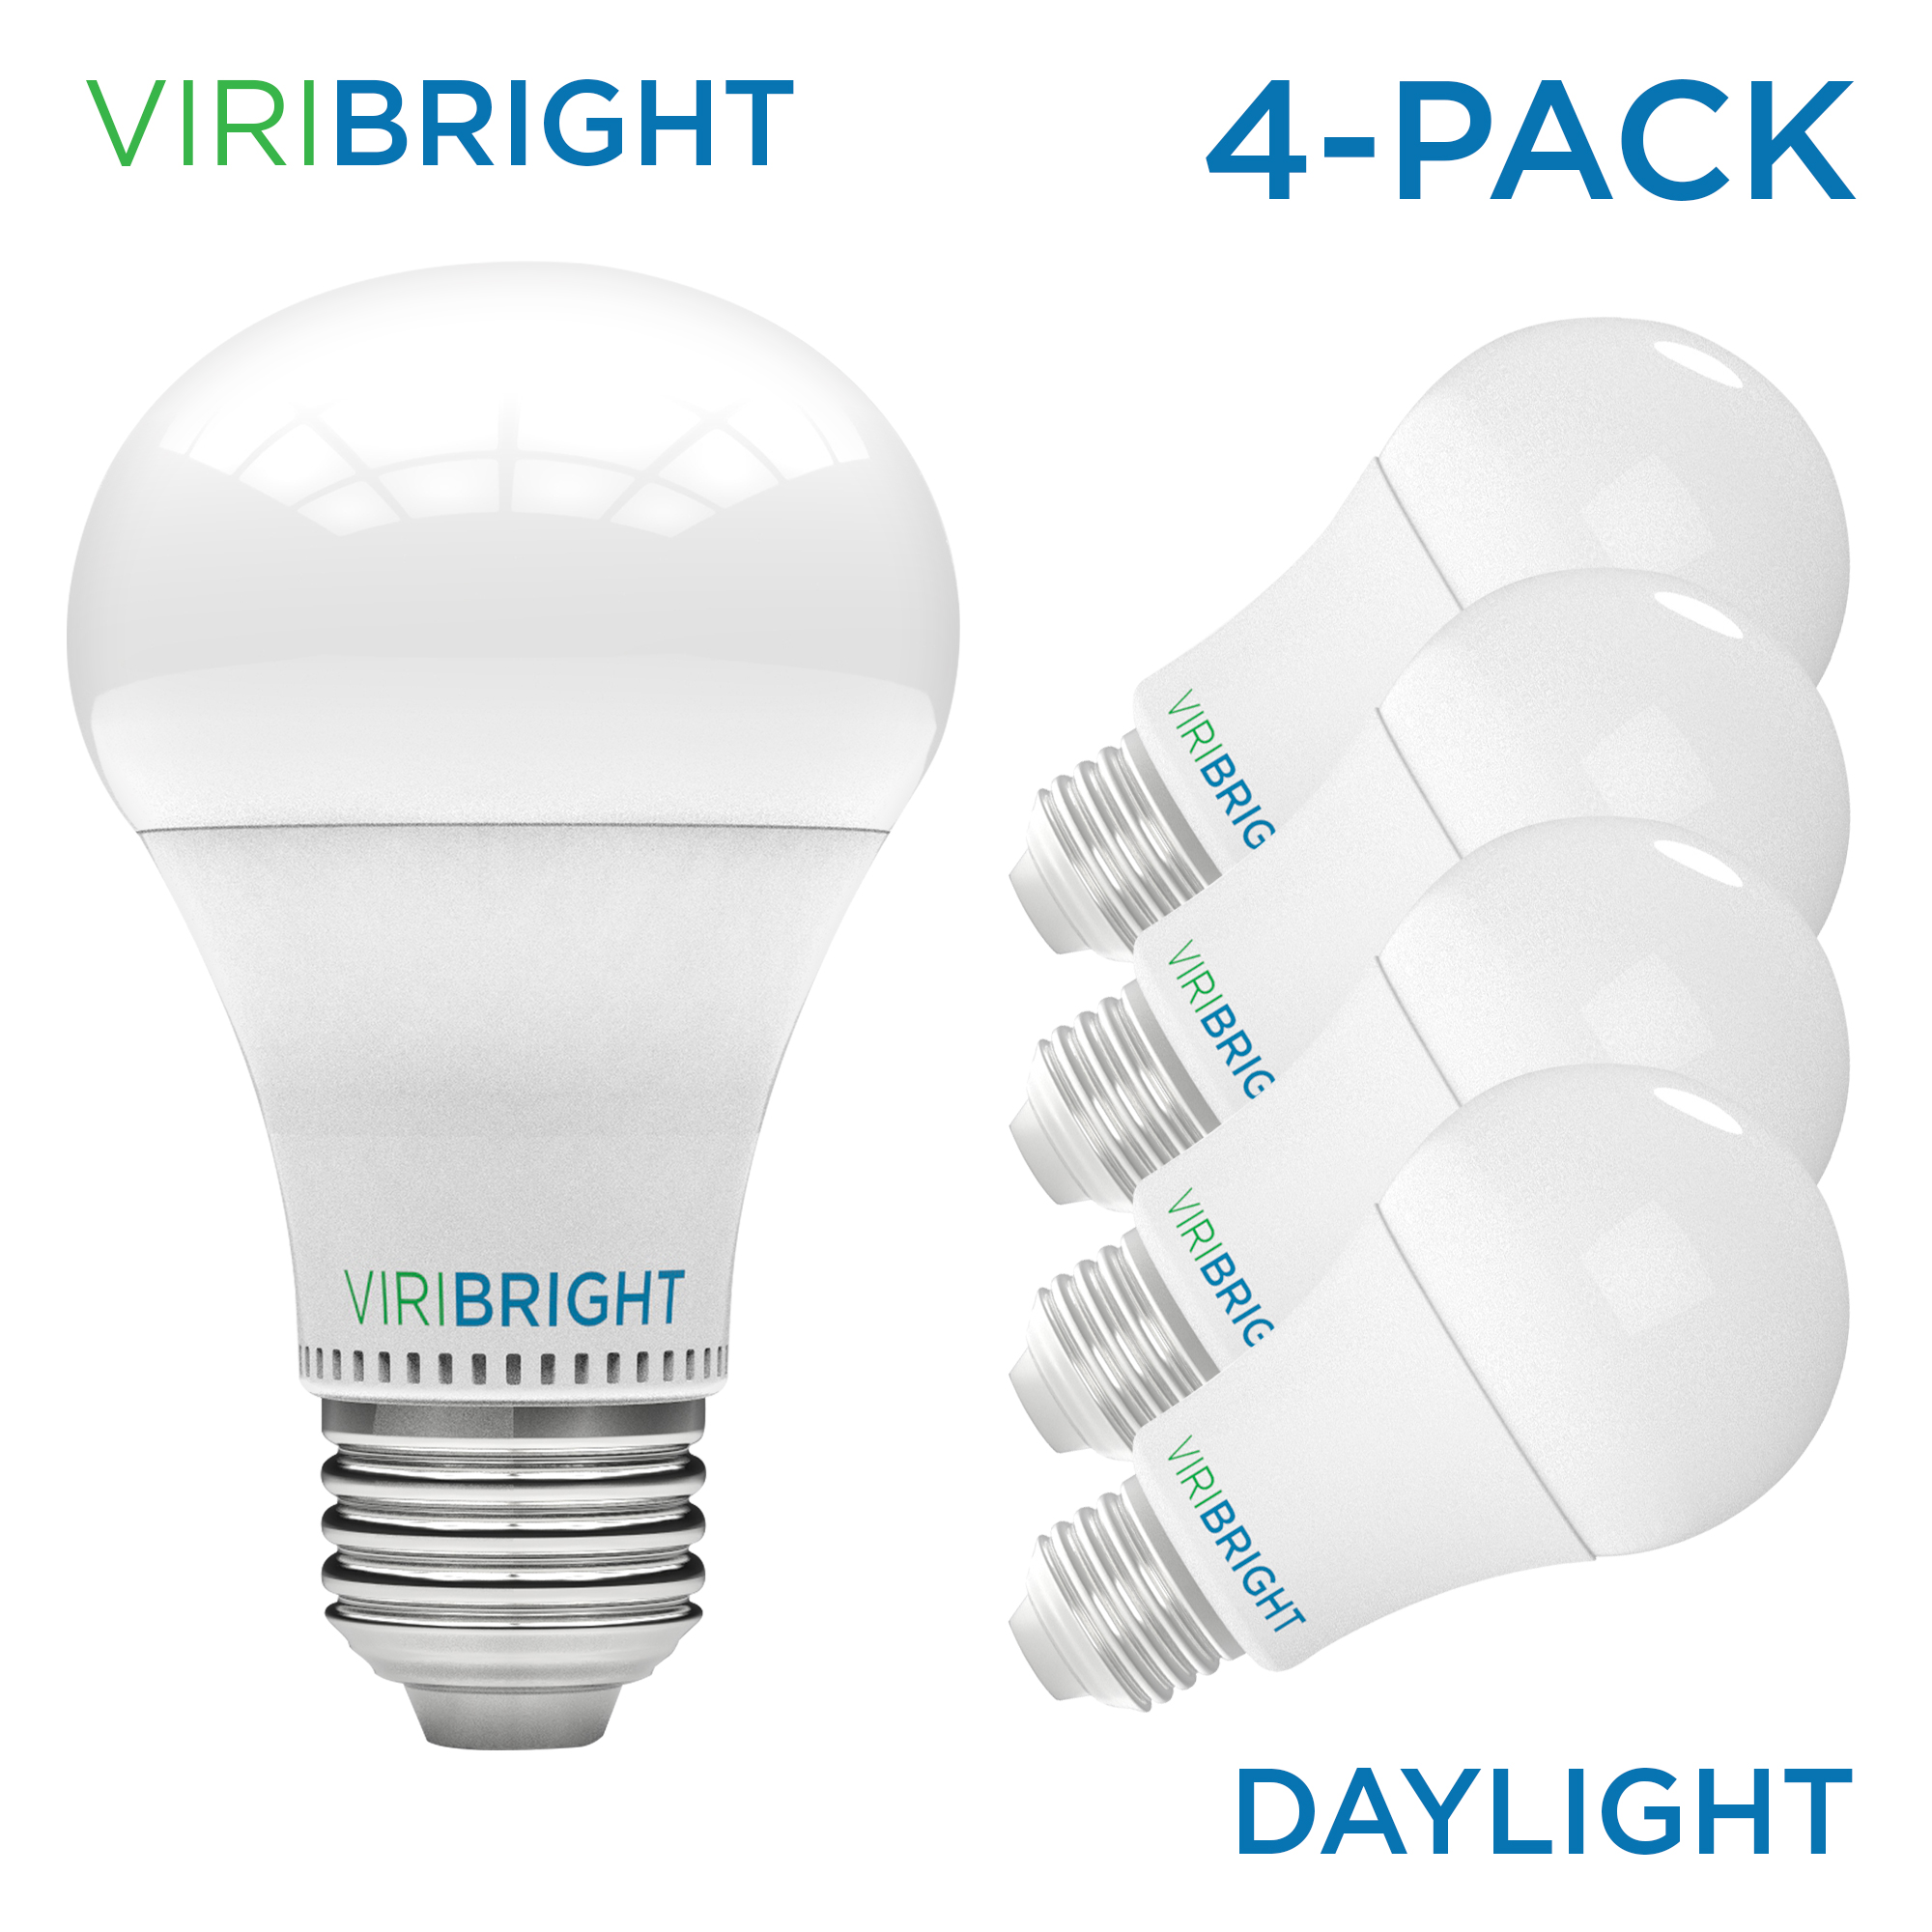 Viribright 100 Watt Equivalent Led Light Bulb 6500k Daylight Medium Screw Base E26 Pack Of 4 Walmart Com Walmart Com